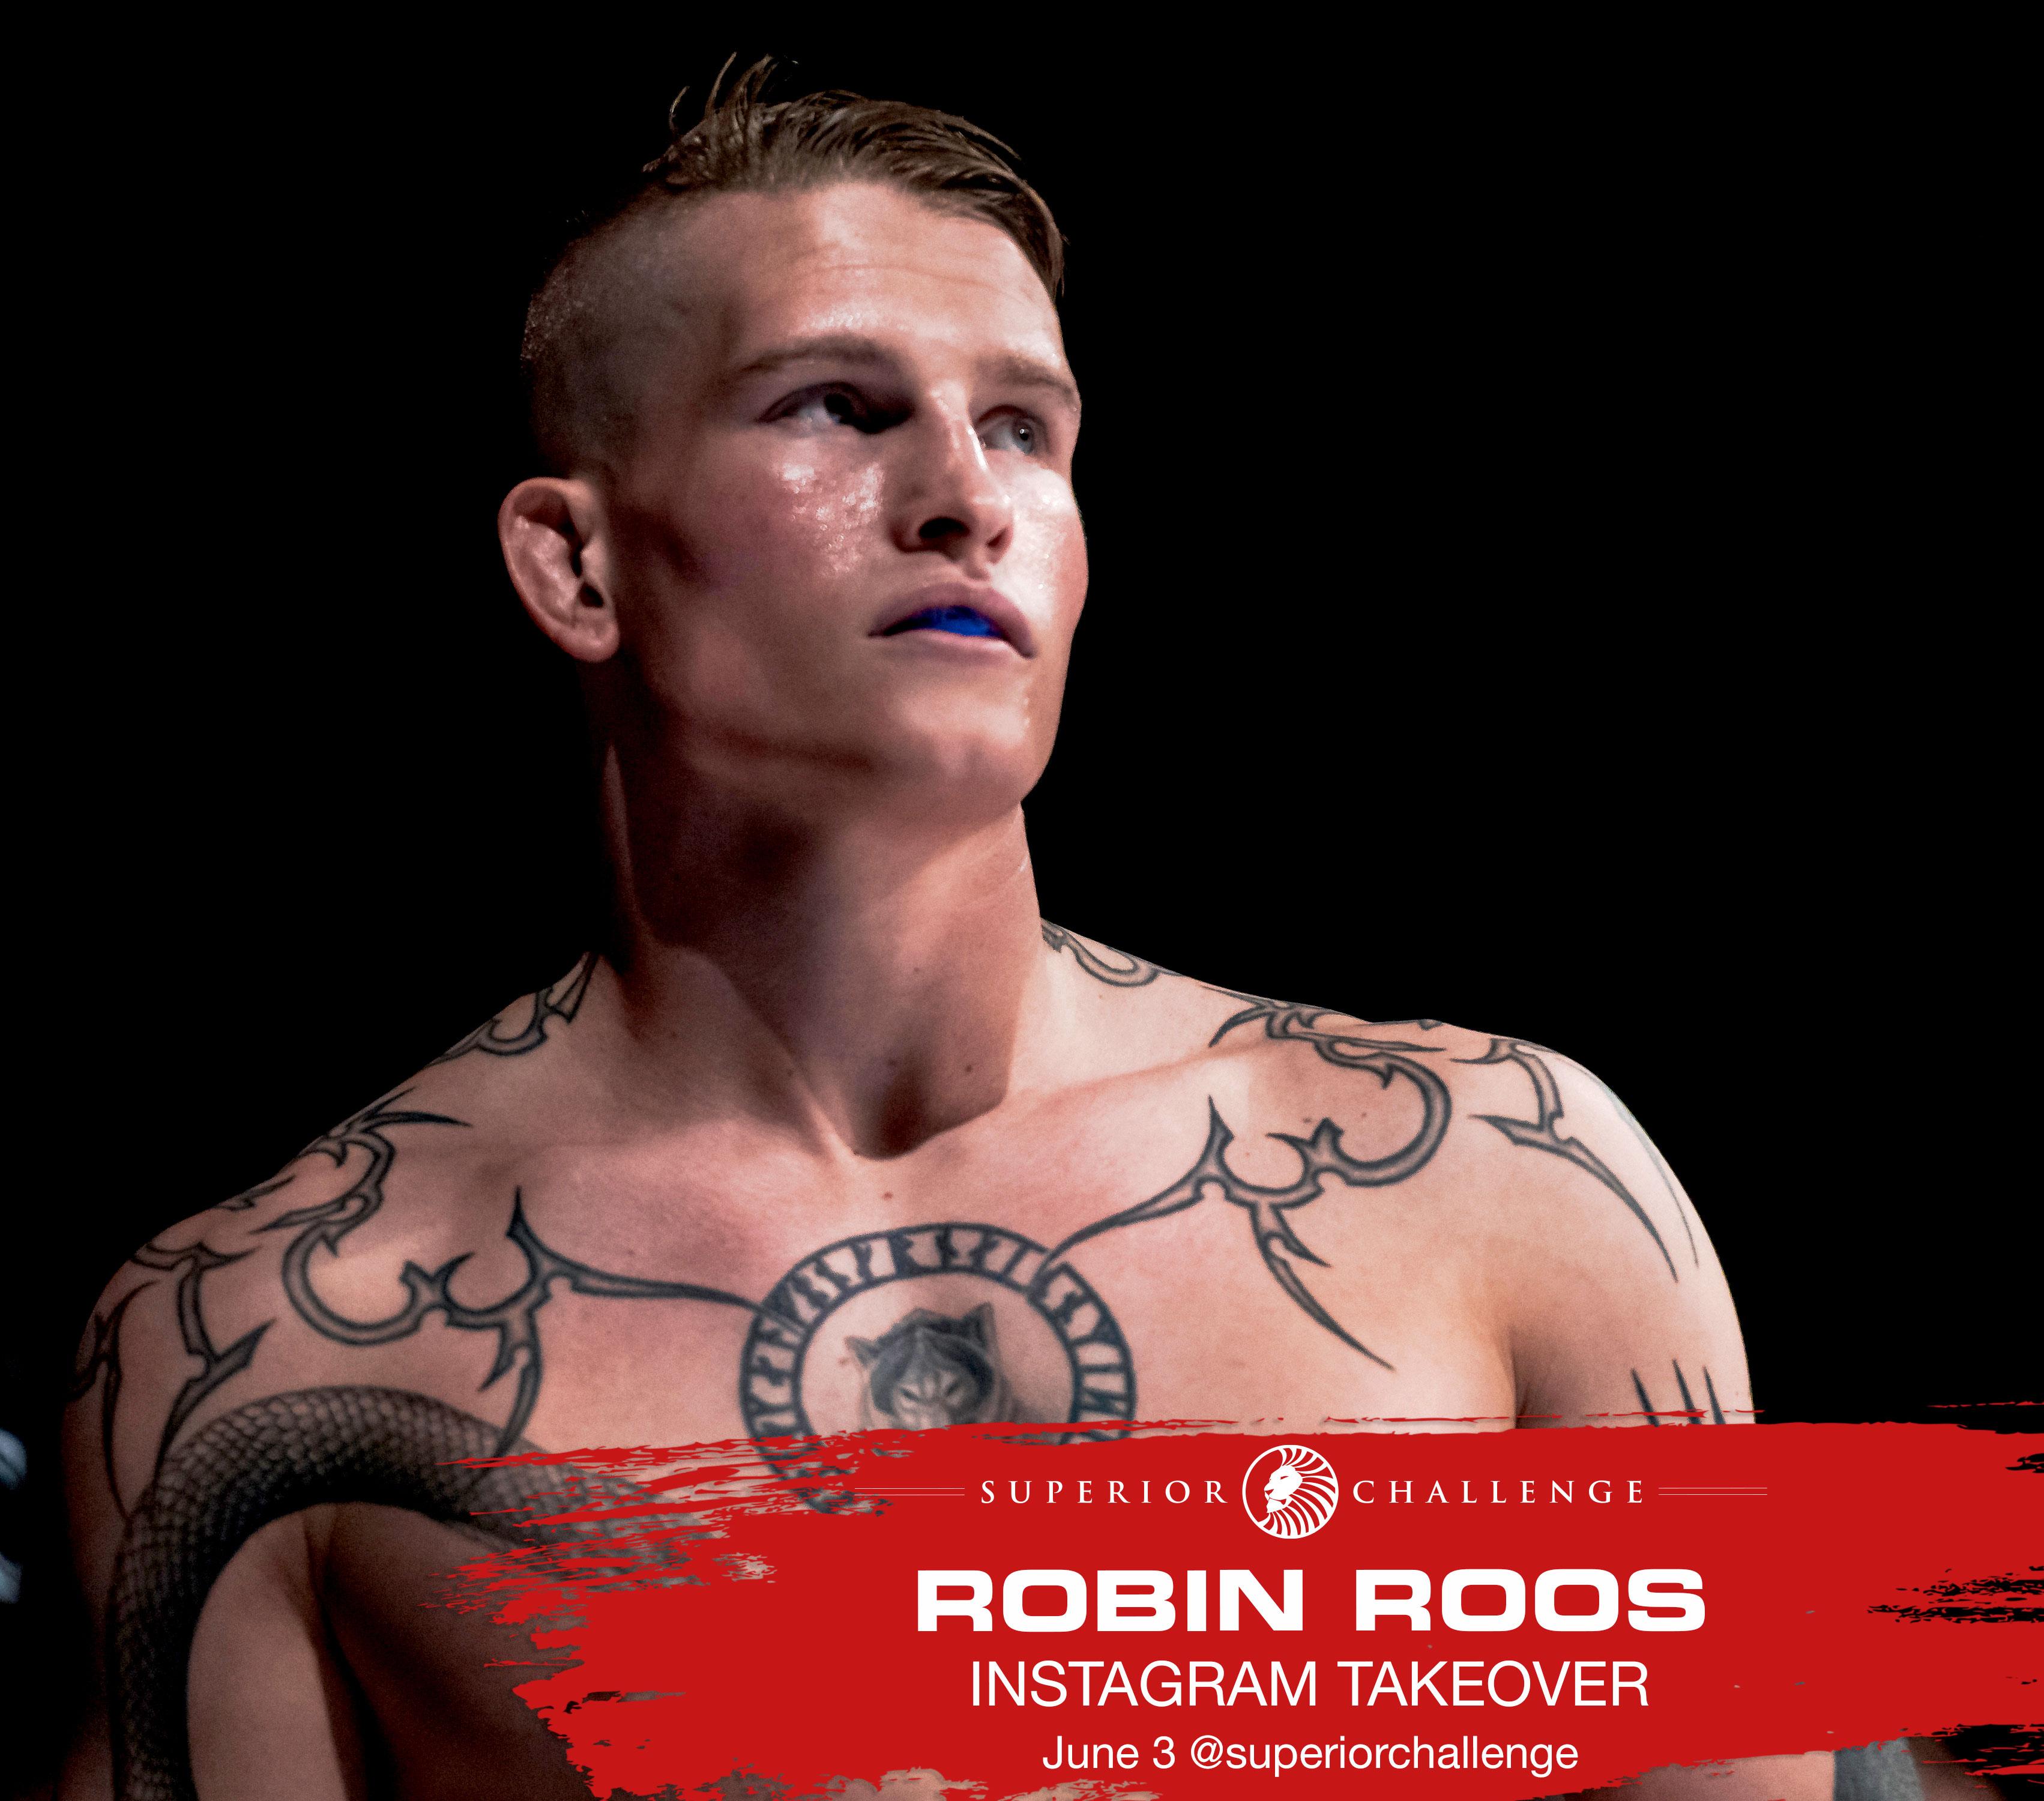 Superior Challenge Instagram Takeover Robin Roos June 2